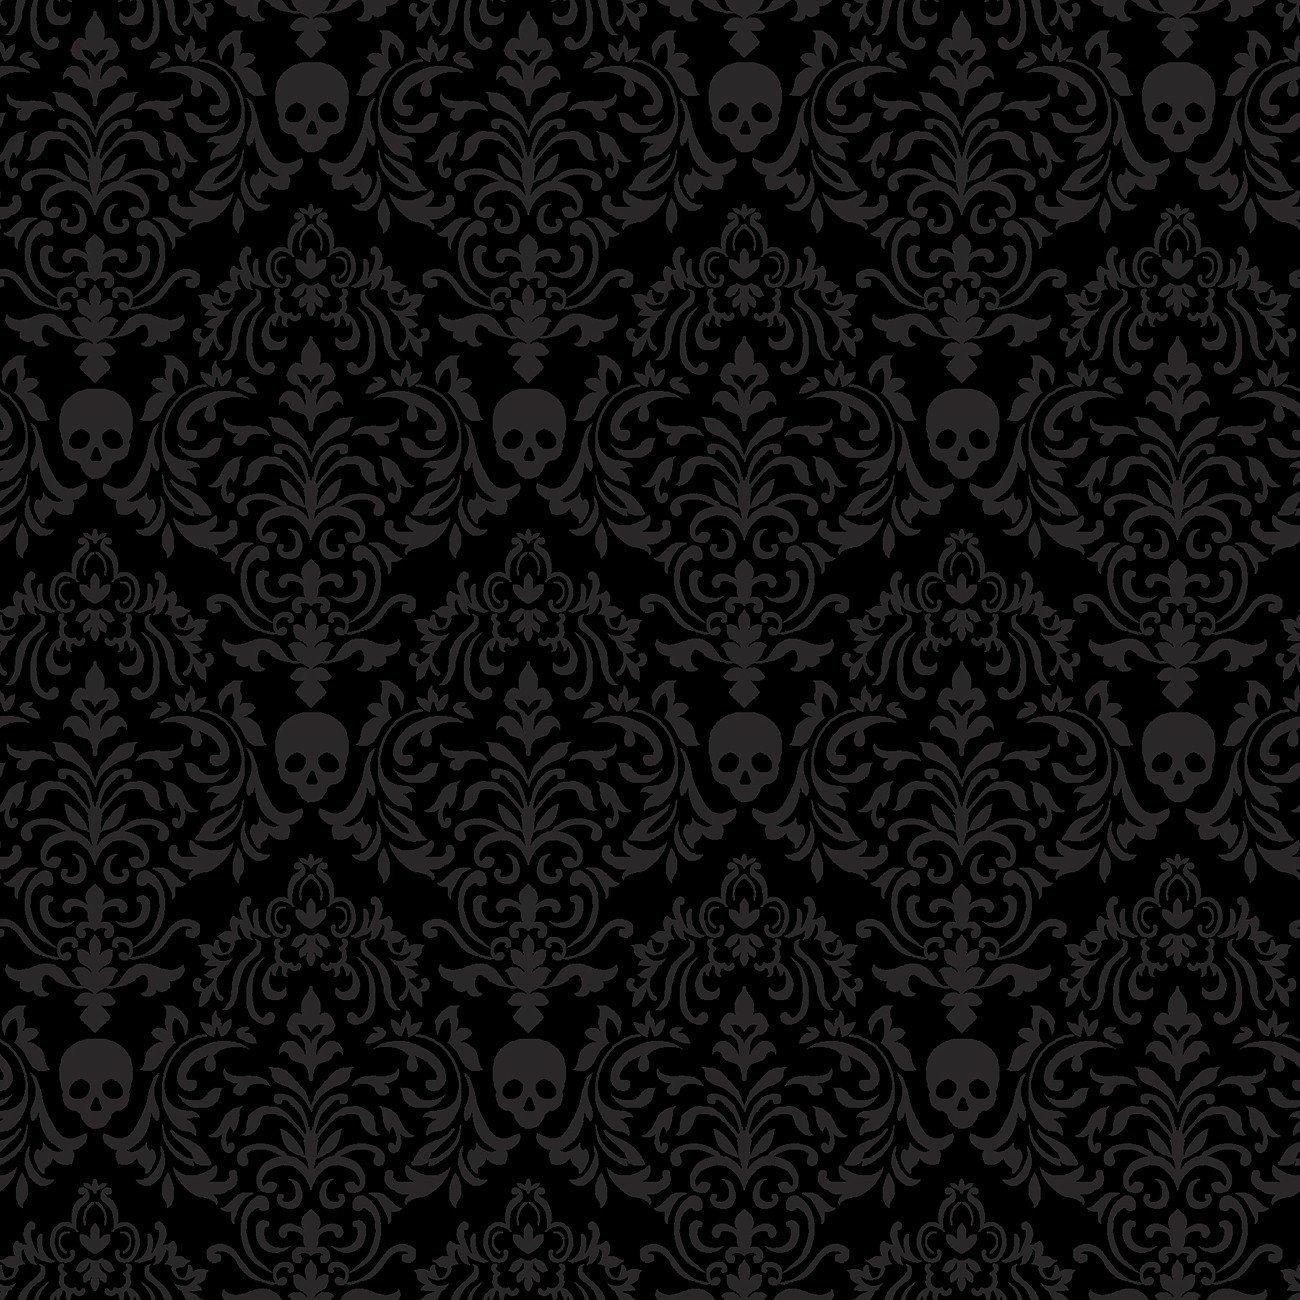 Spooky Night - Spooky Small Damask Black